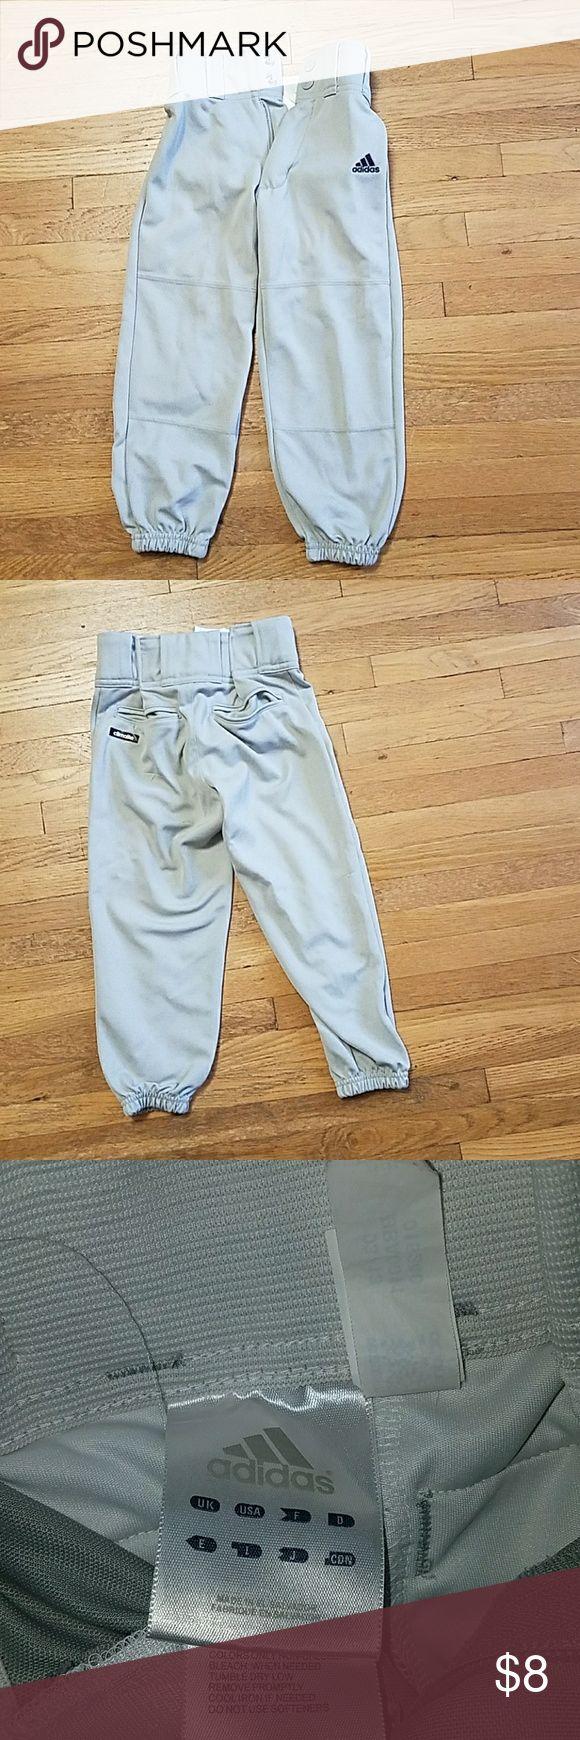 Adidas Baseball Pants Size Youth XXS Adidas Baseball Pants Size Youth XXS. These have 2 snaps and a zipper. Unisex for boys or girls. adidas Bottoms Sweatpants & Joggers